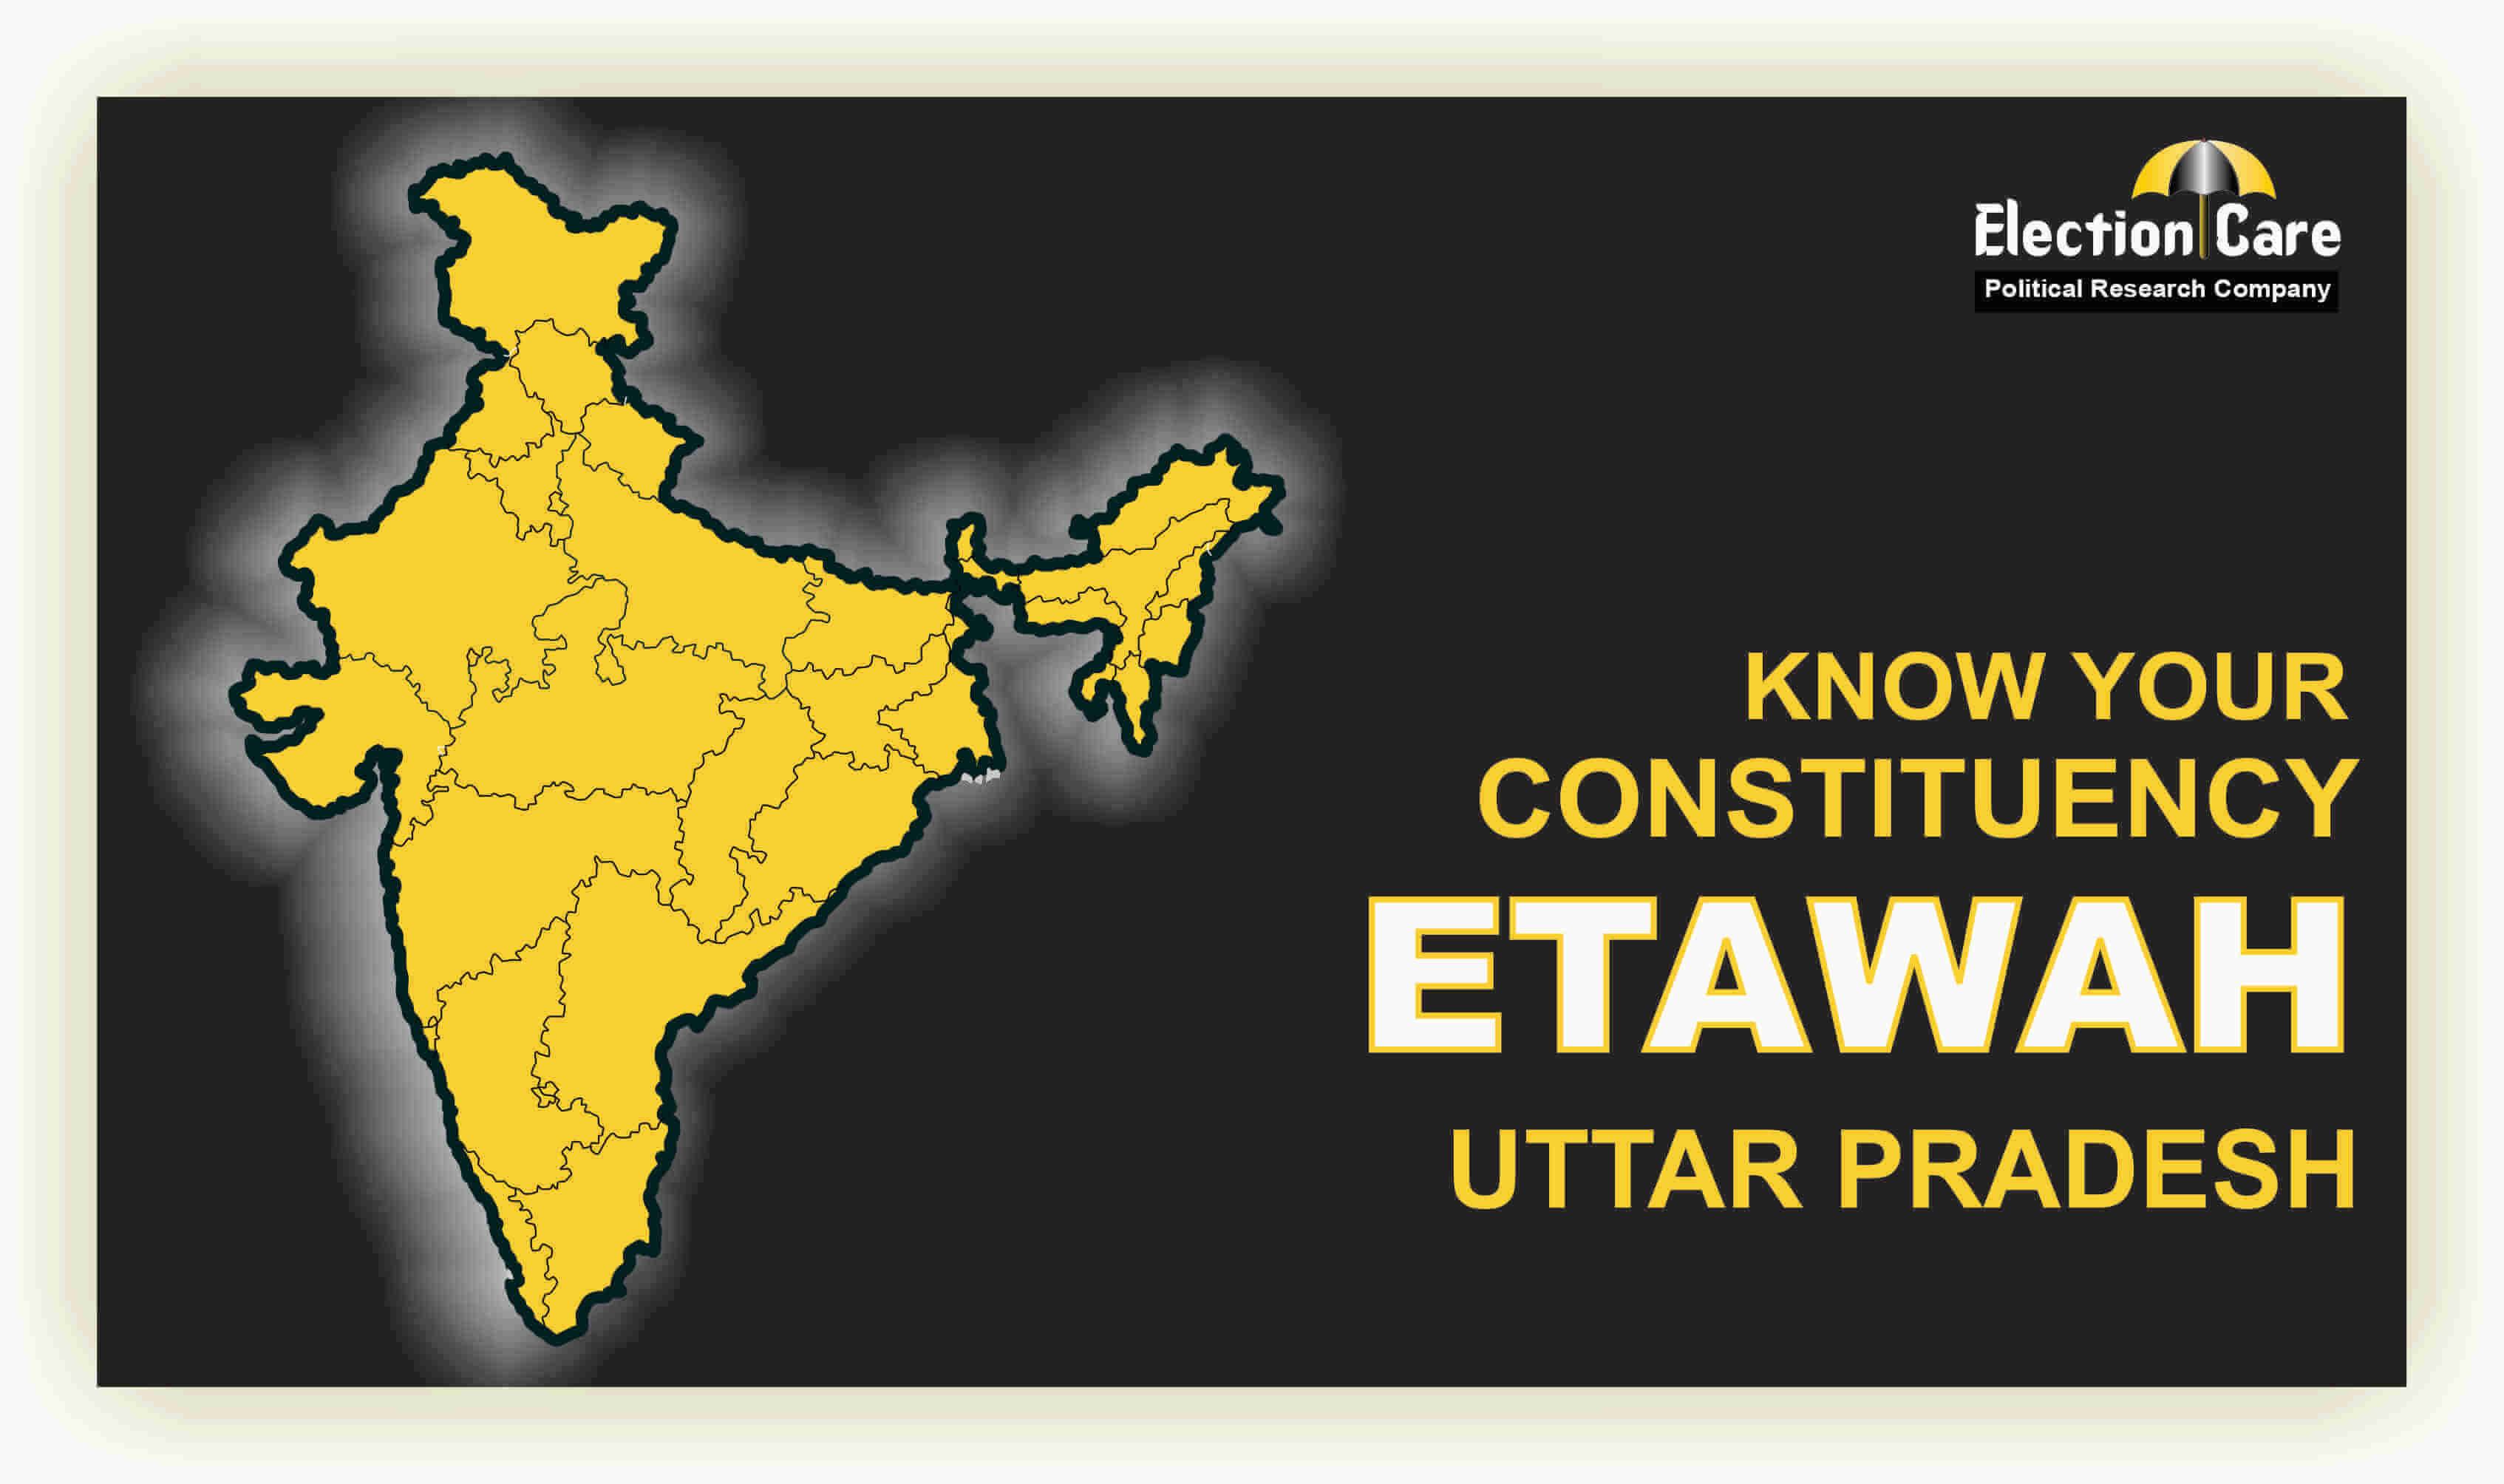 Etawah Parliament Election Result